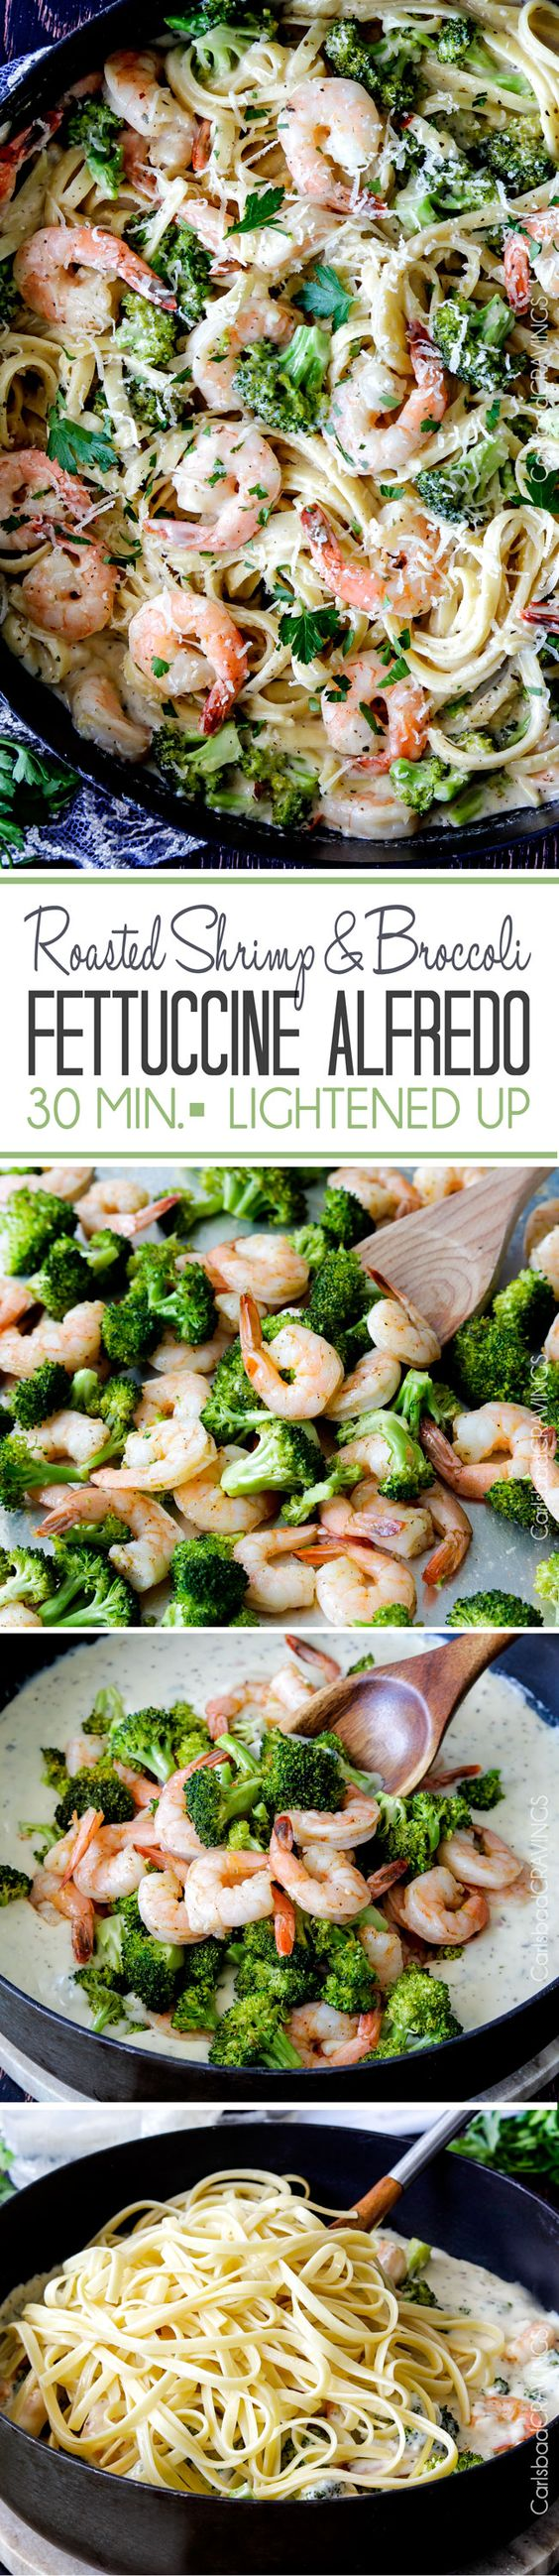 Shrimp and broccoli, Roasted shrimp and Shrimp on Pinterest